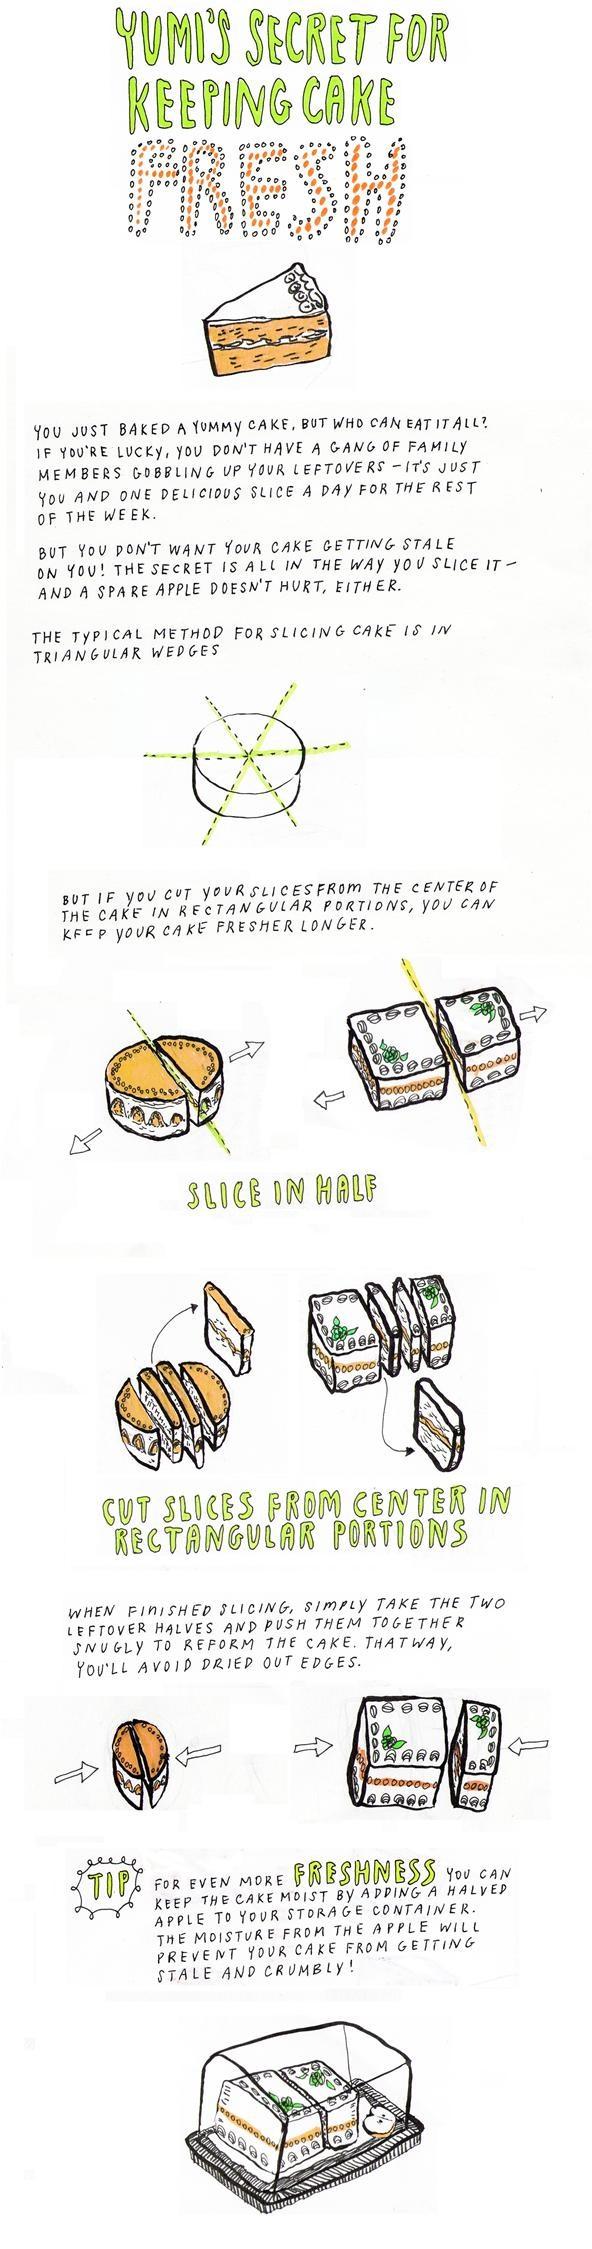 The Secret to Keeping Cake Fresh